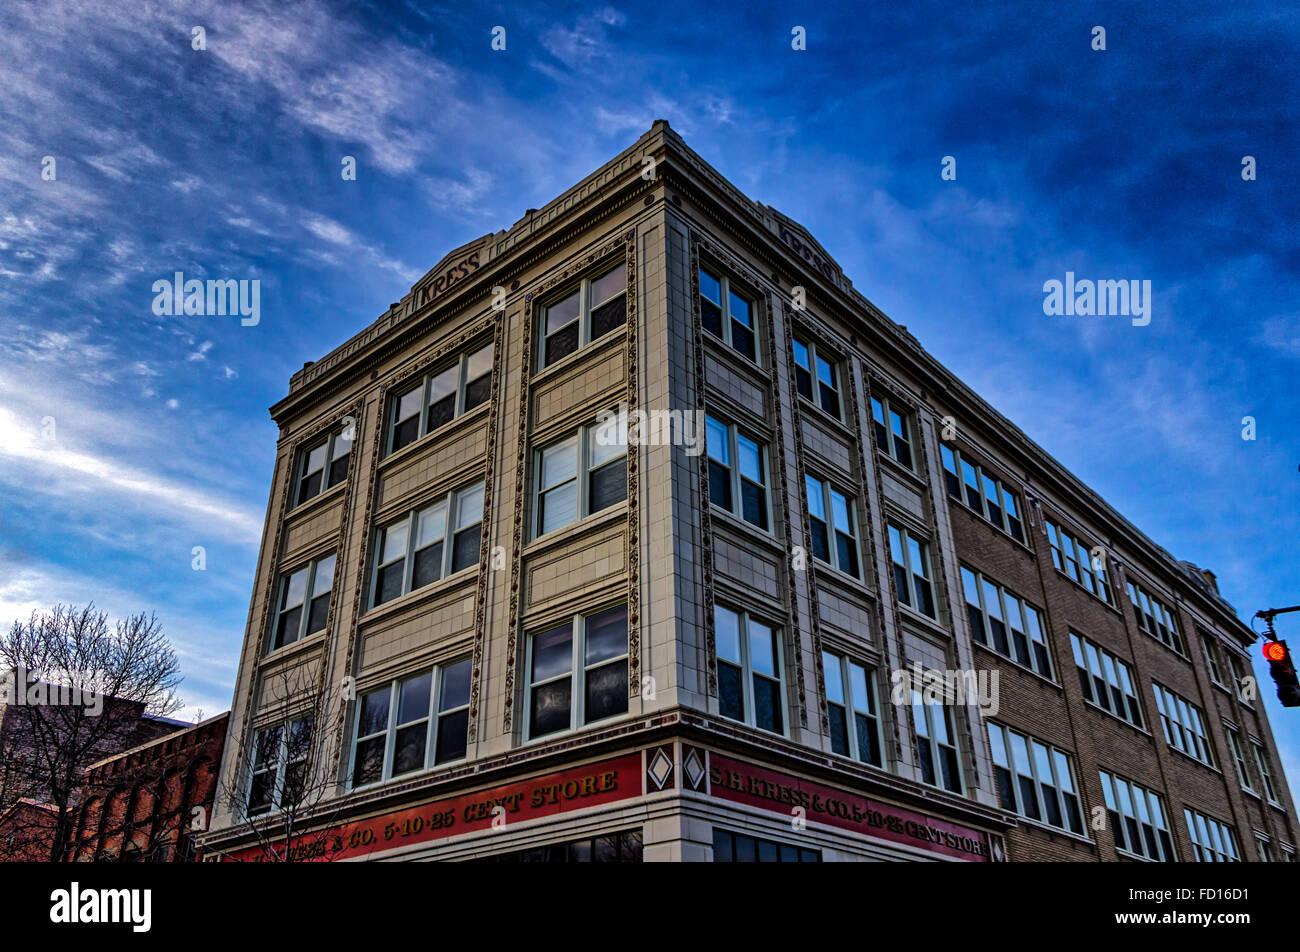 Random Building in Asheville, North Carolina, USA - Stock Image